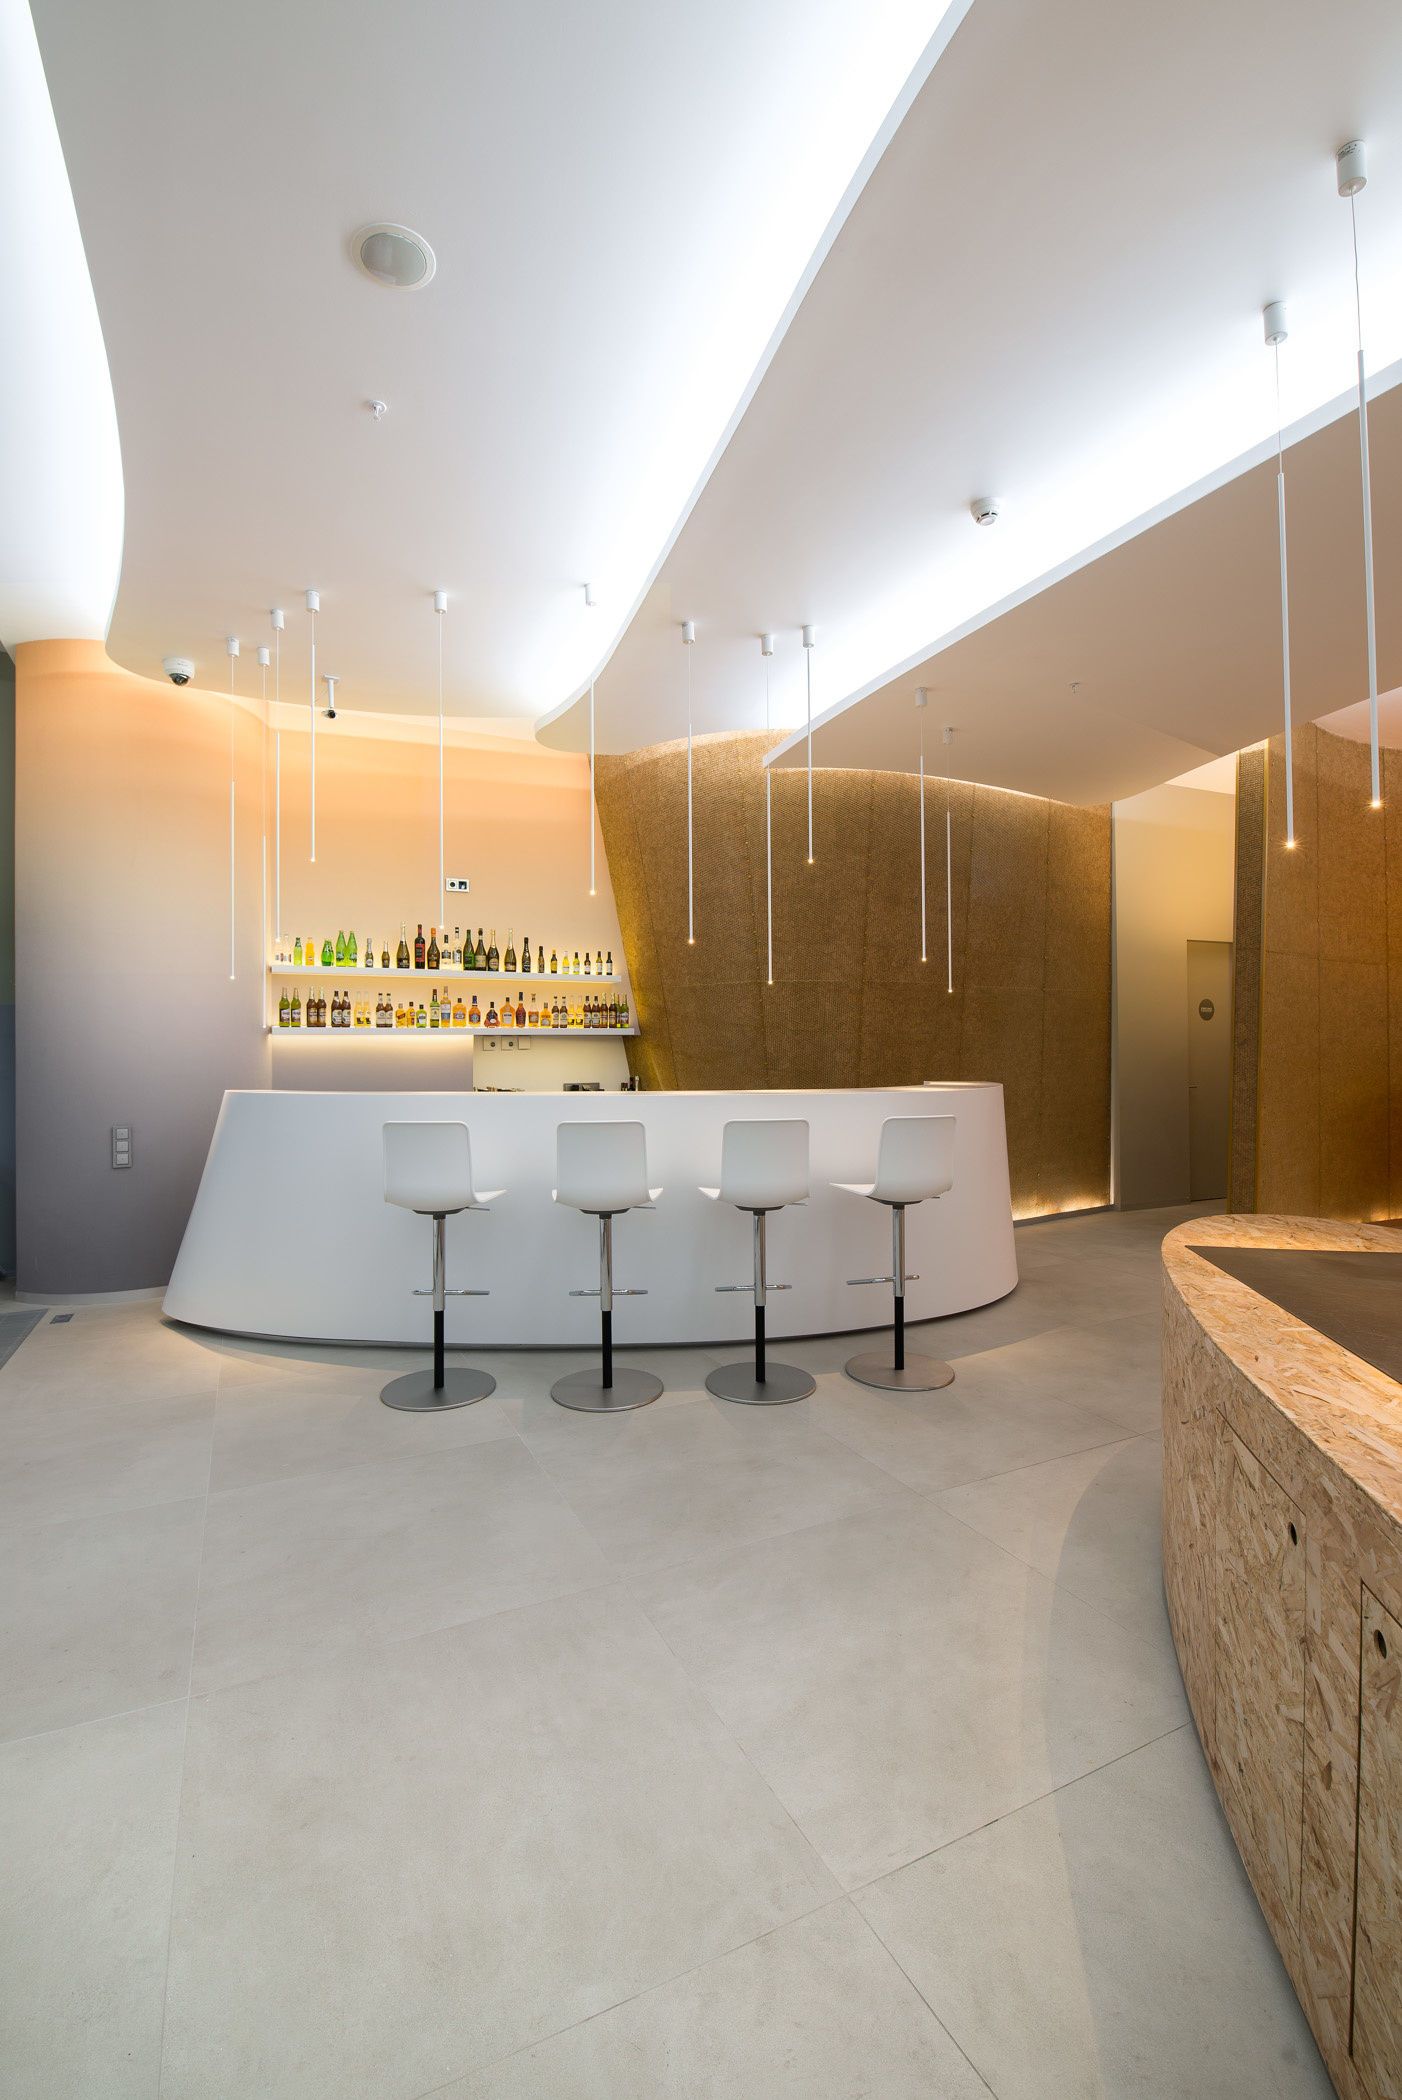 Бизнес-лаунж аэропорта «Платов» в Ростове-на-Дону: проект VOX Architects (галерея 9, фото 1)